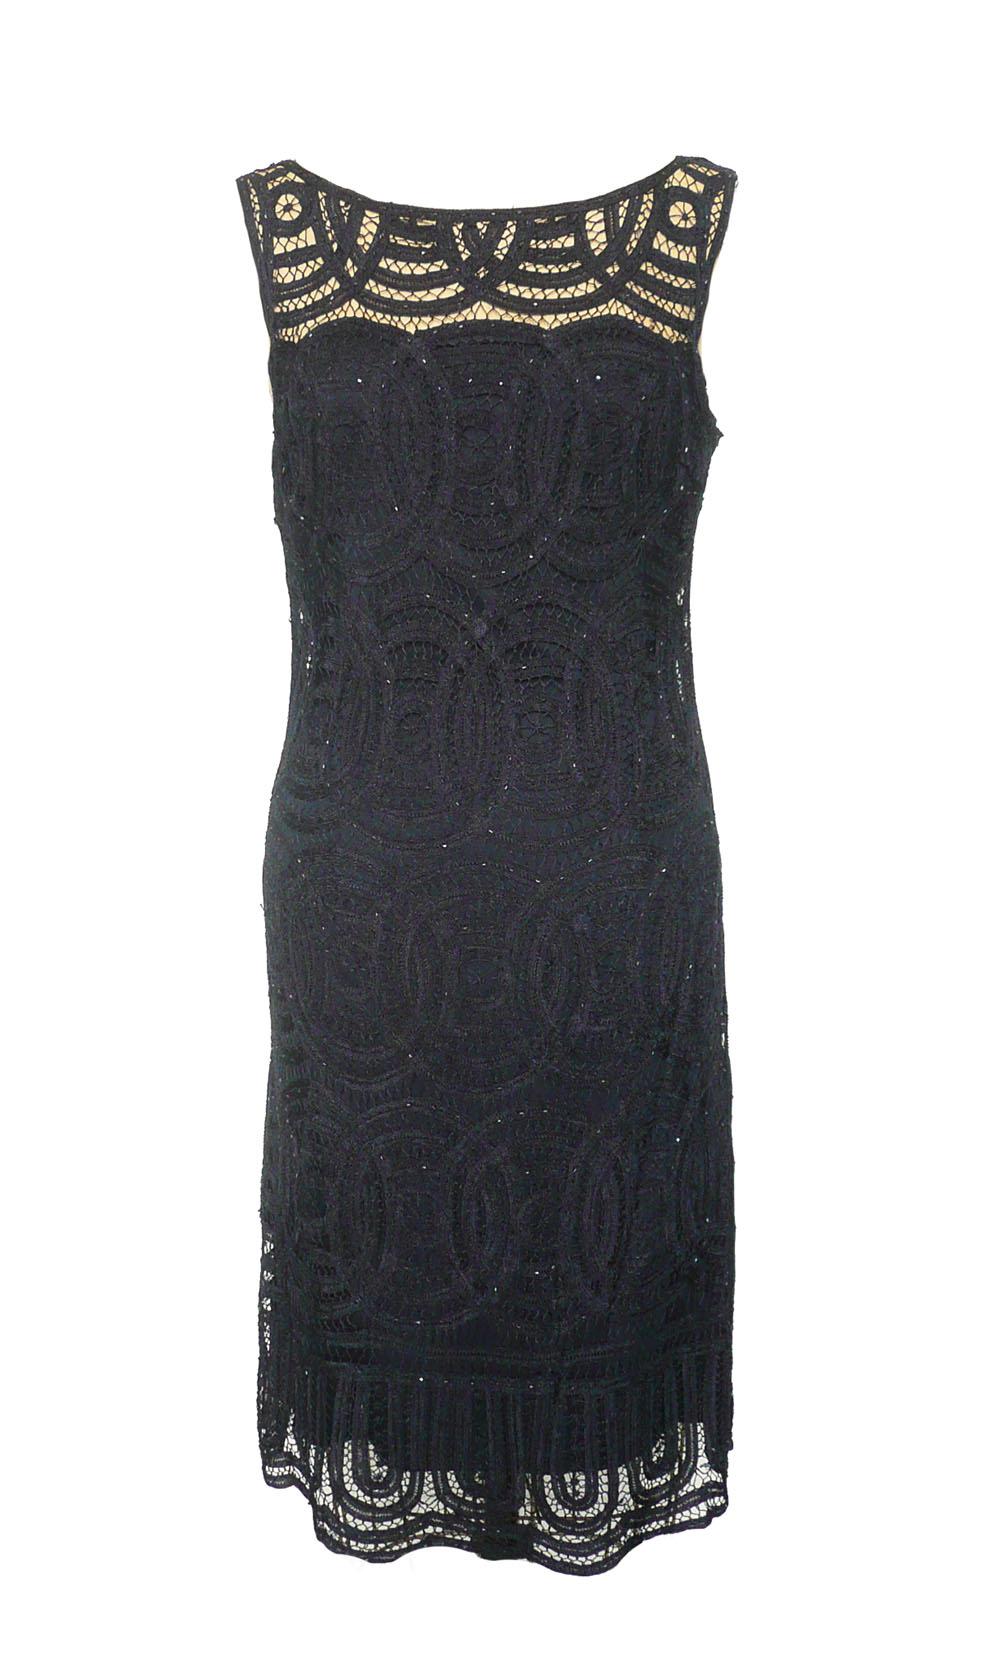 dress bead lace nvy.jpg